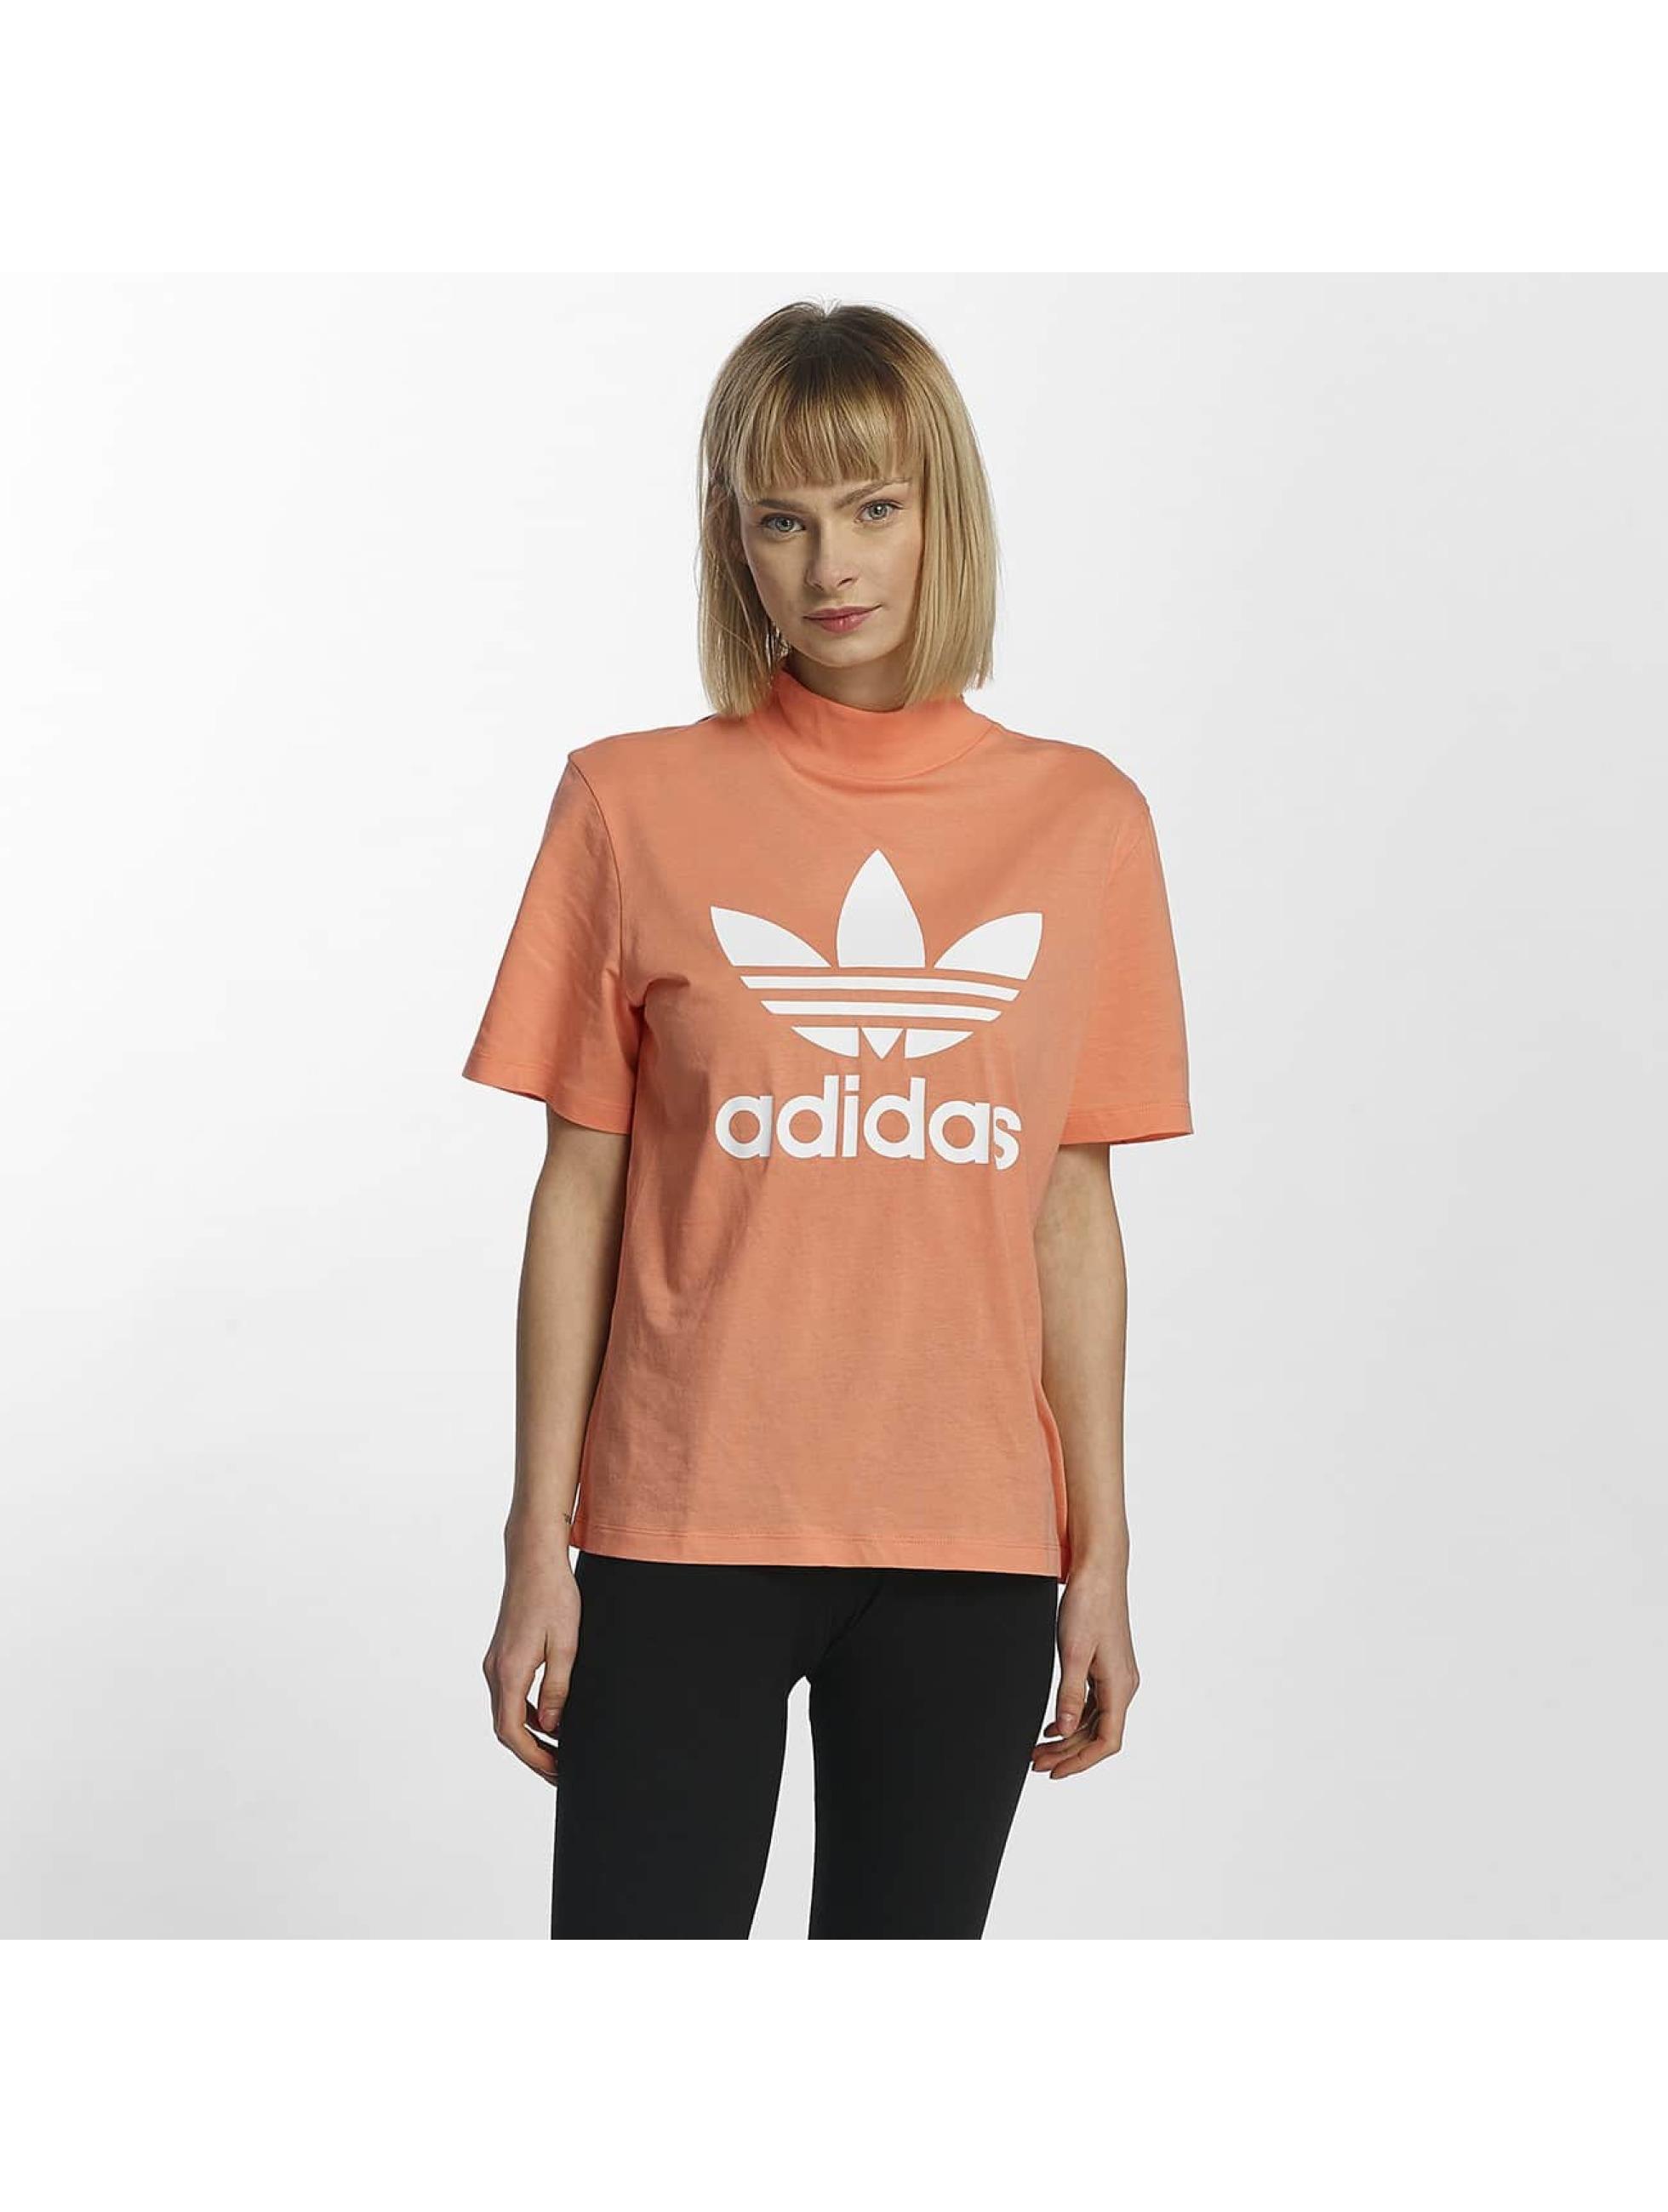 adidas pw hu hiking orange femme t shirt adidas acheter pas cher haut 369429. Black Bedroom Furniture Sets. Home Design Ideas